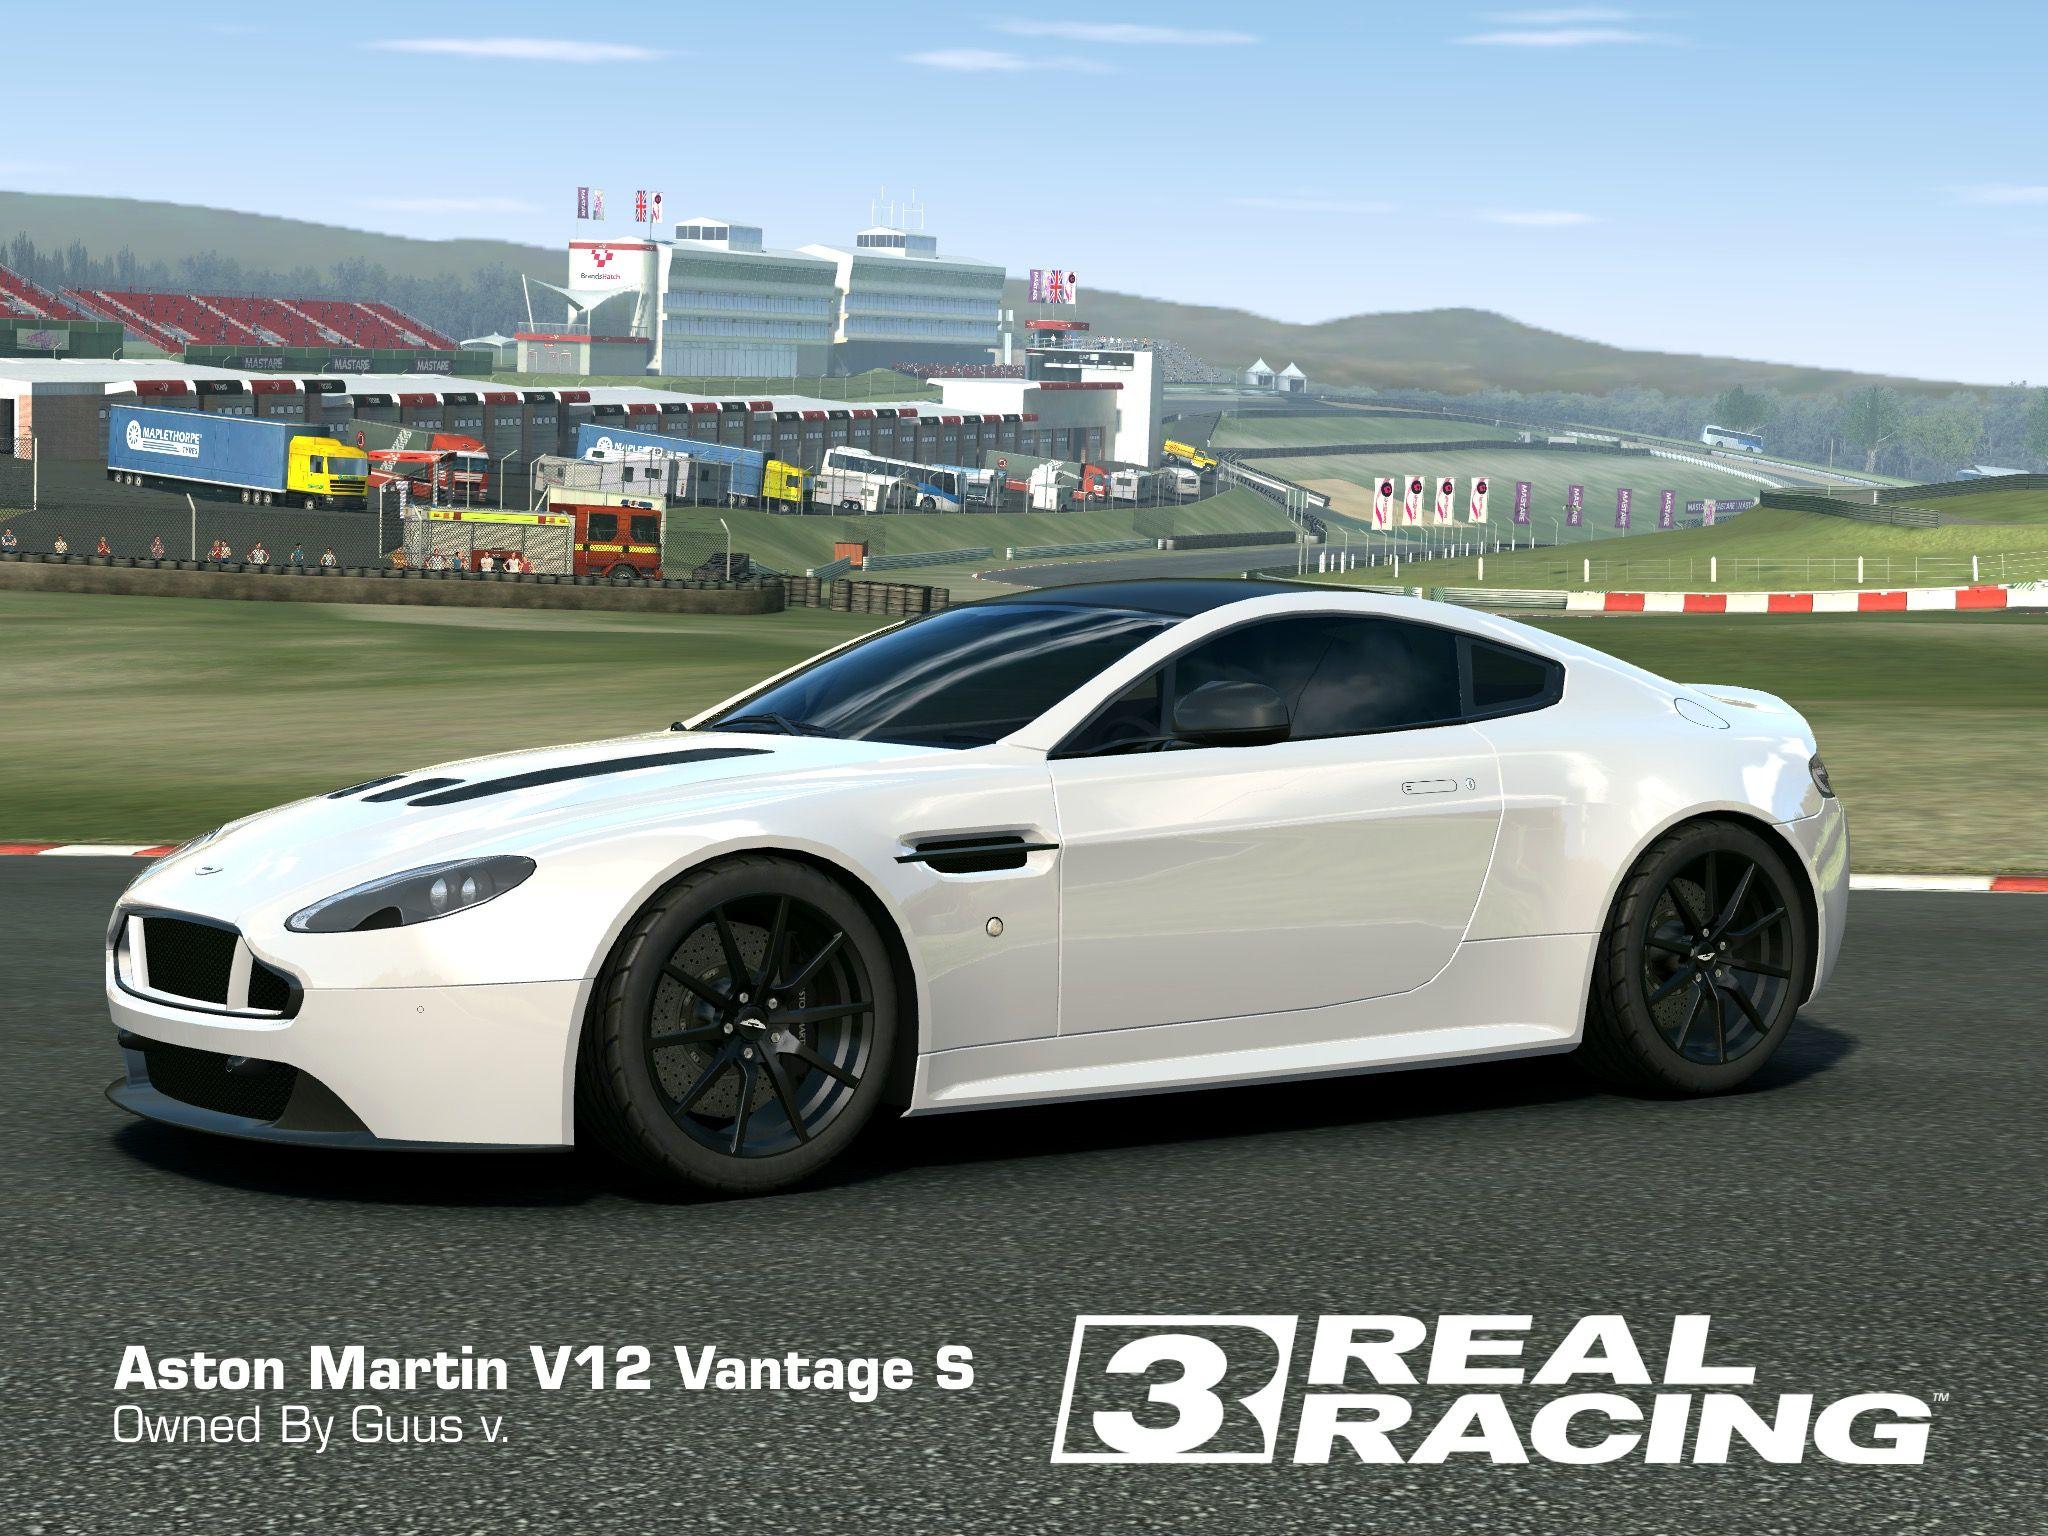 aston martin v12 vantage s   my real racing 3 cars   pinterest